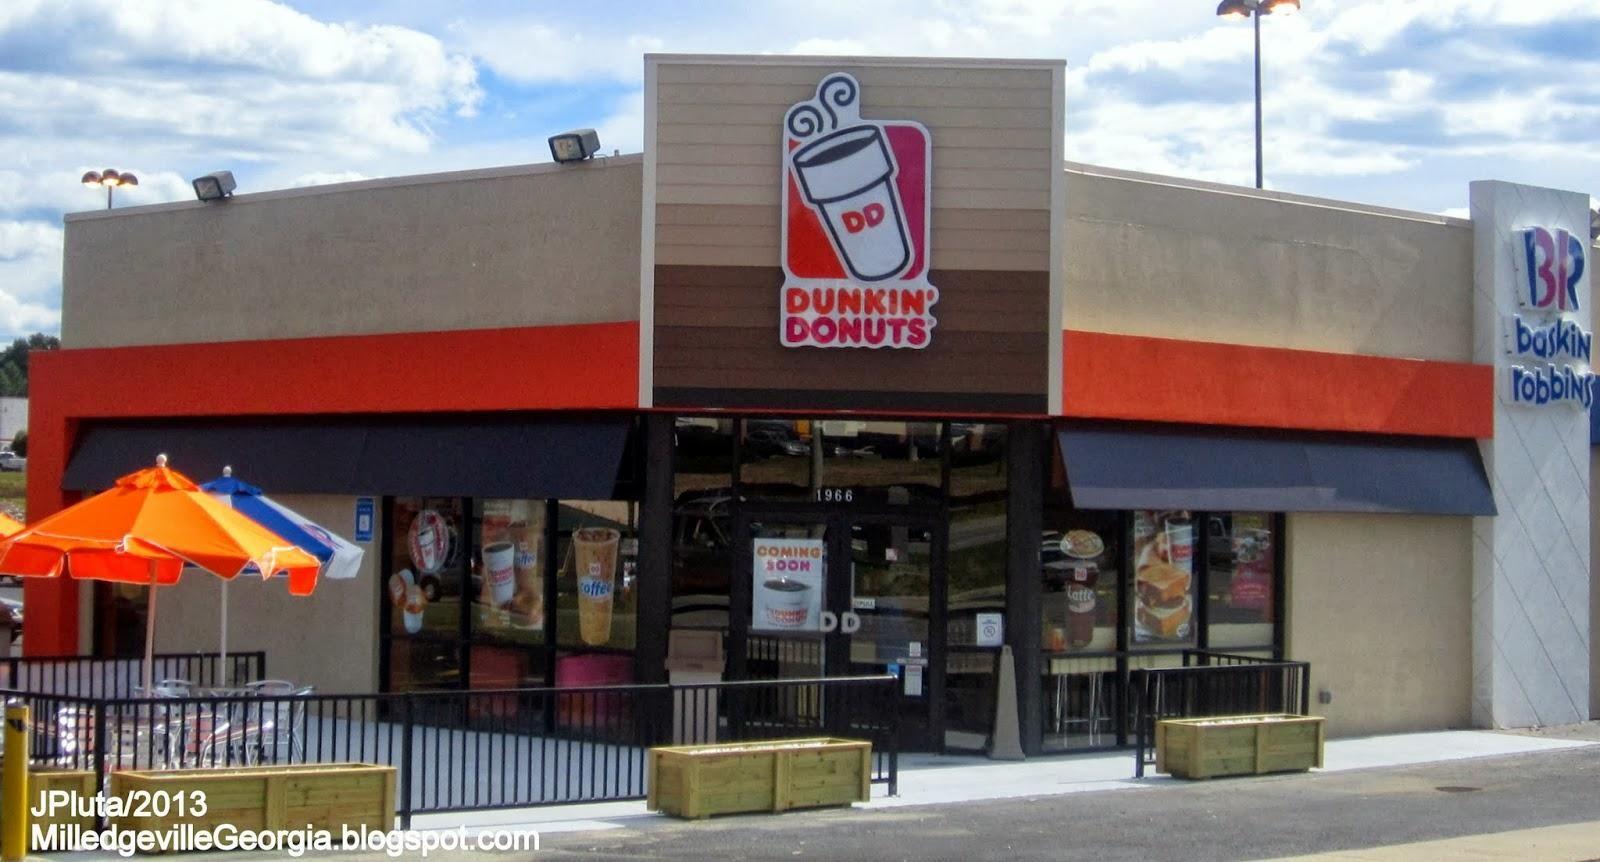 Dunkin donuts application jobs hiring learn how to apply today dunkin donuts application jobs hiring learn how to apply today online job applications 2017 pinterest buckets biocorpaavc